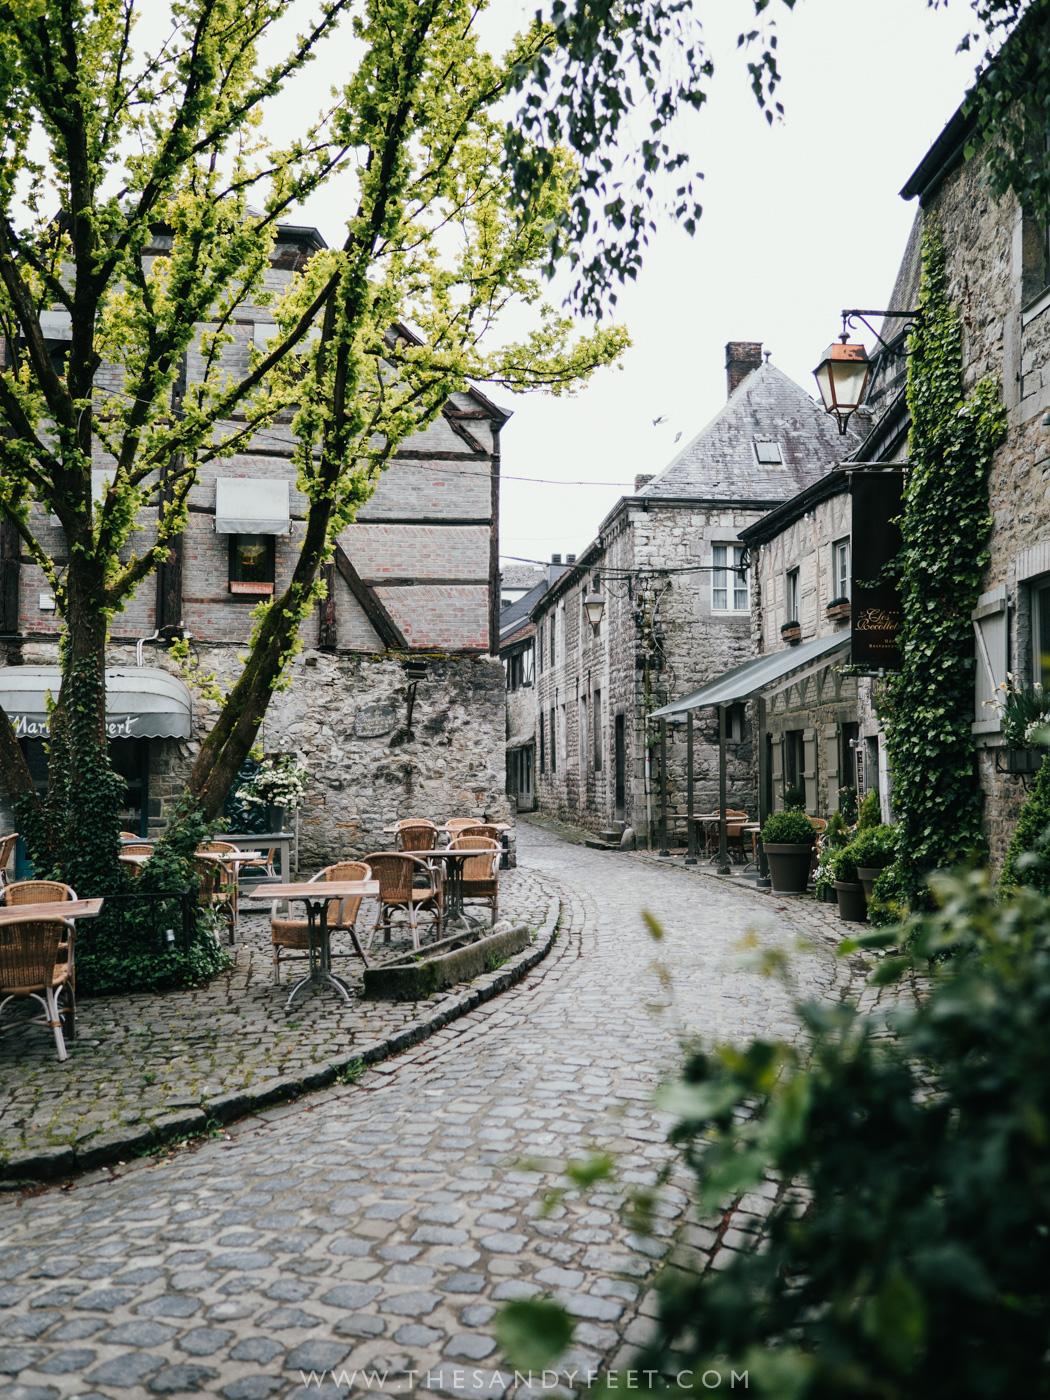 Exploring Durbuy   Top Things To Do In Belgium's Wallonia Region